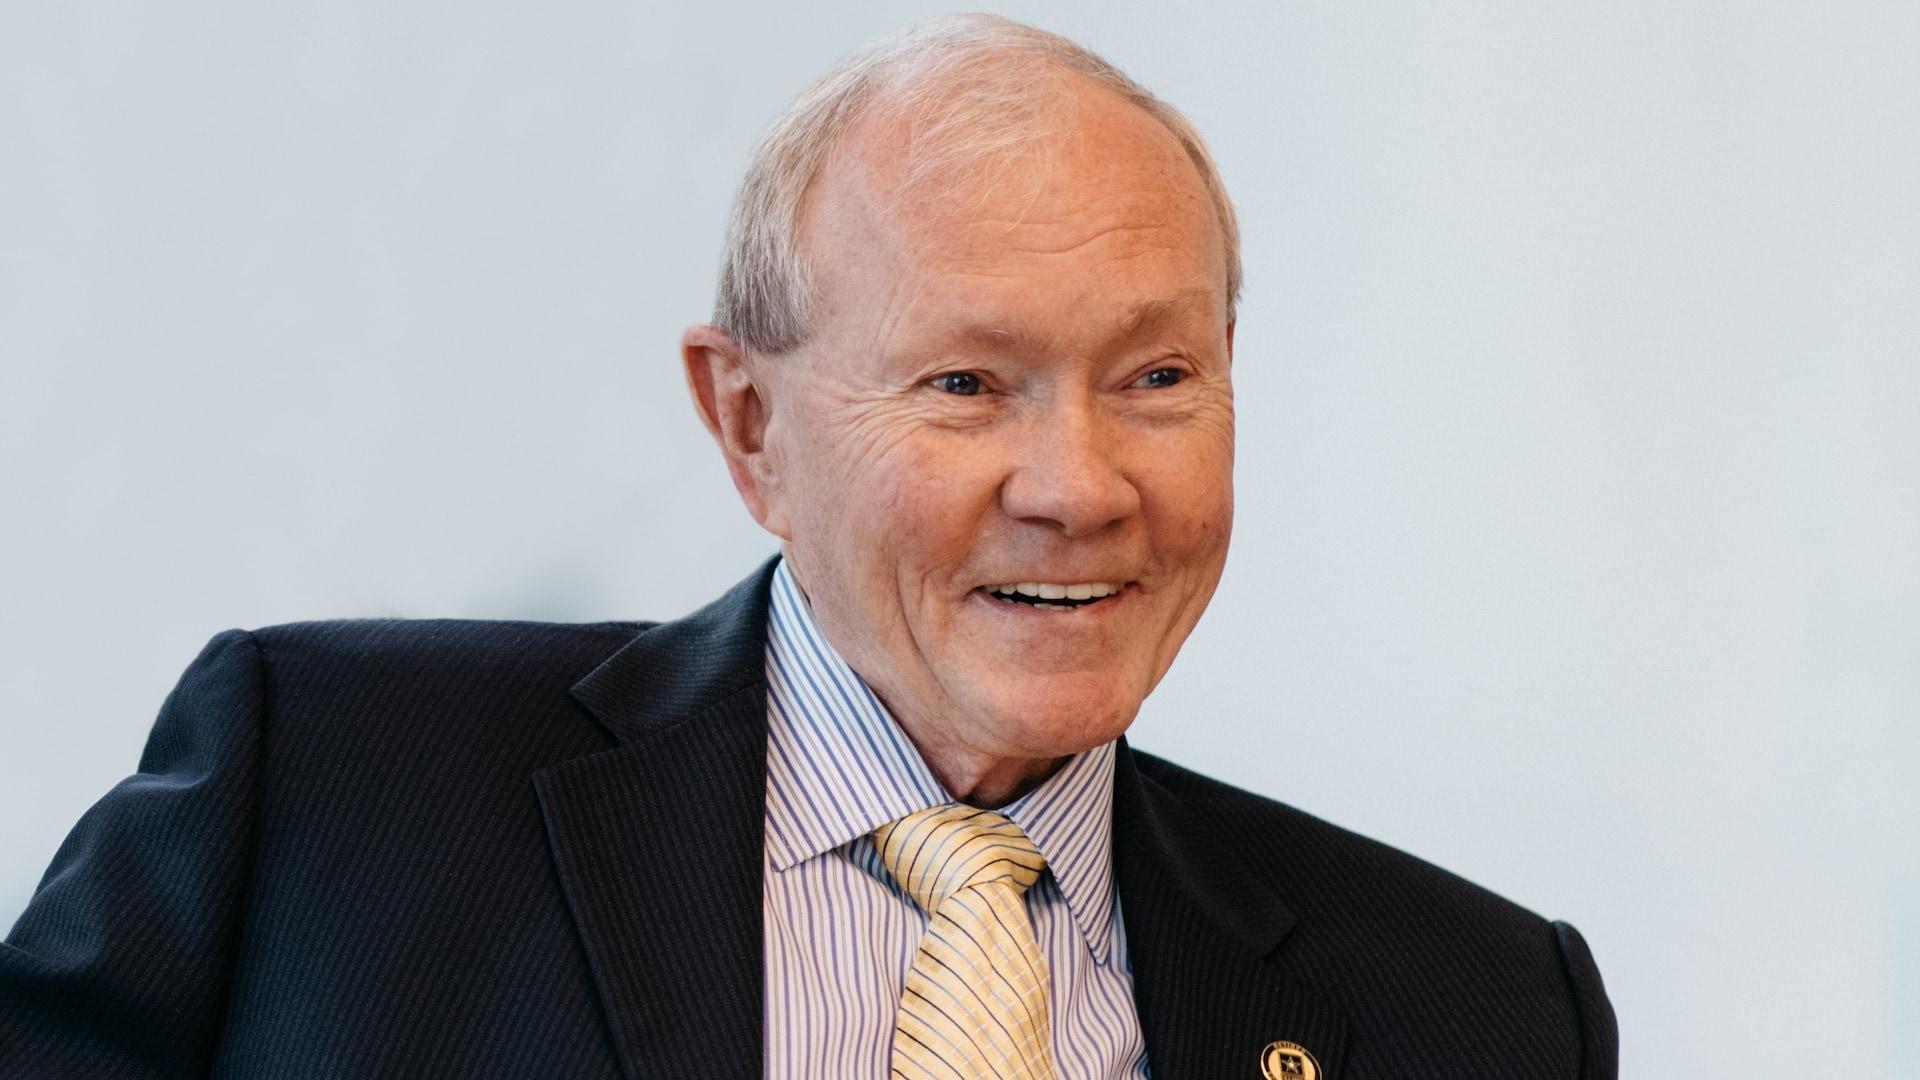 Q&A: Retired Gen. Martin Dempsey on leadership, living a 'felt life'